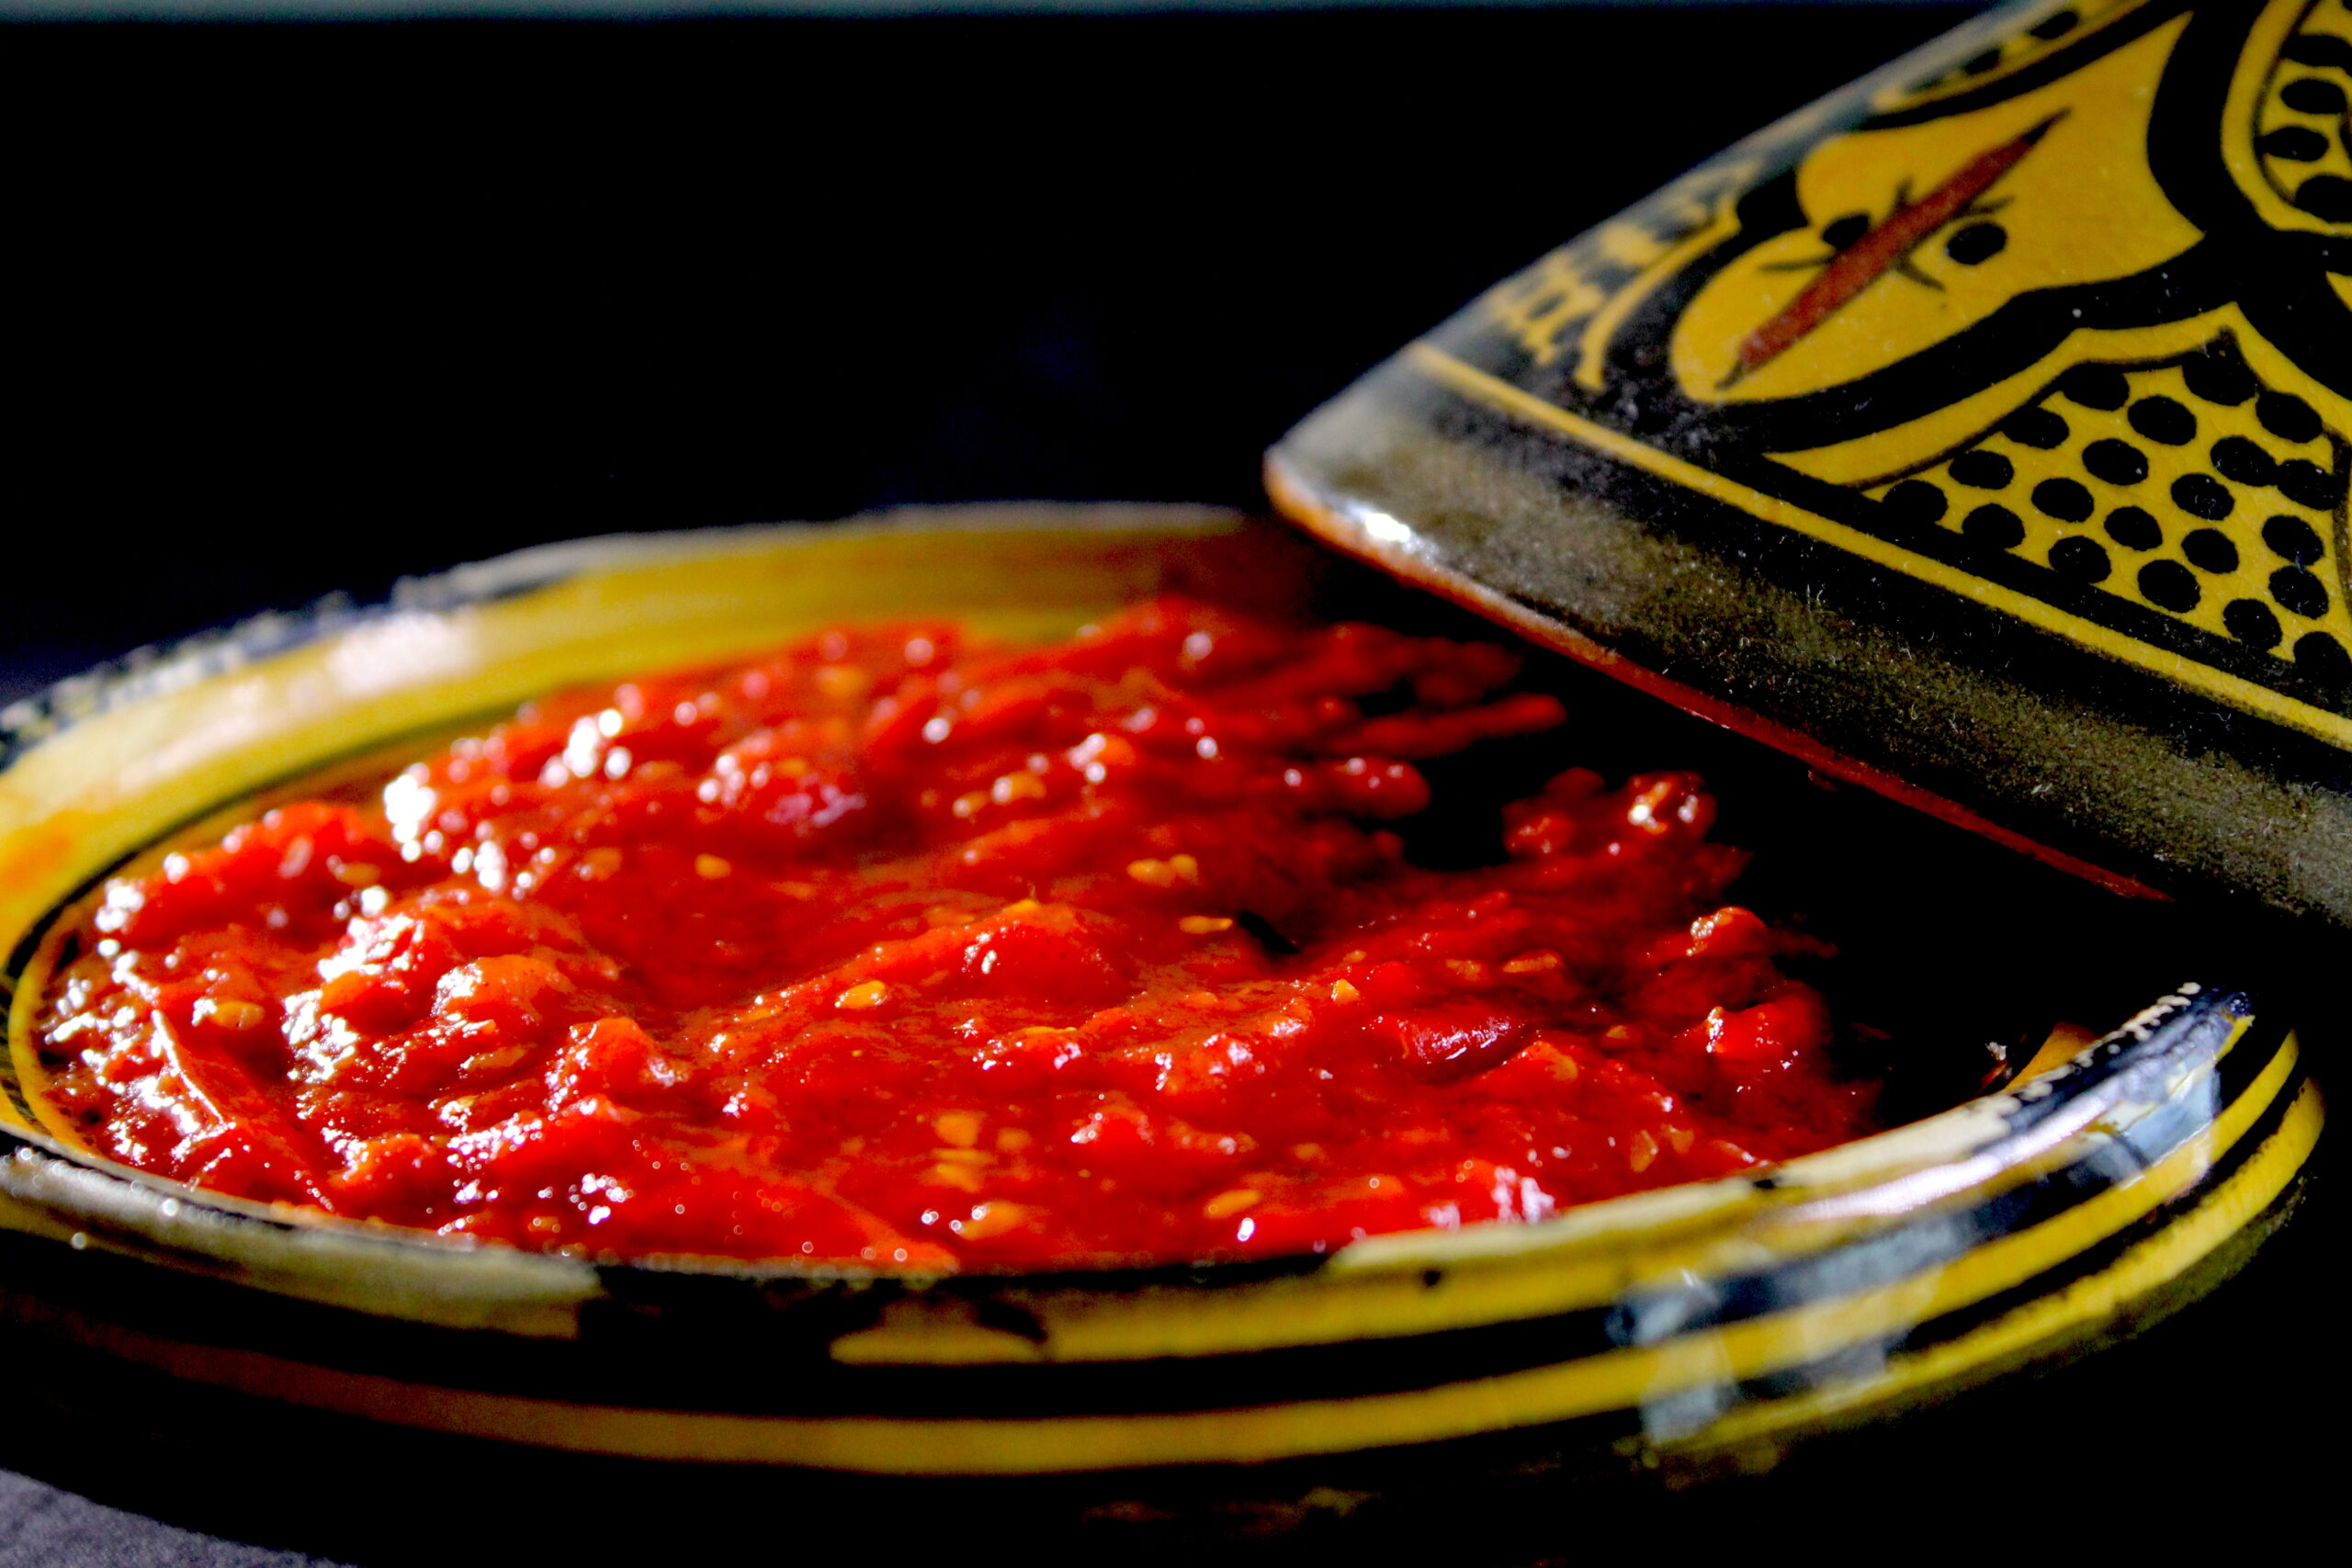 Sweet tomato dip